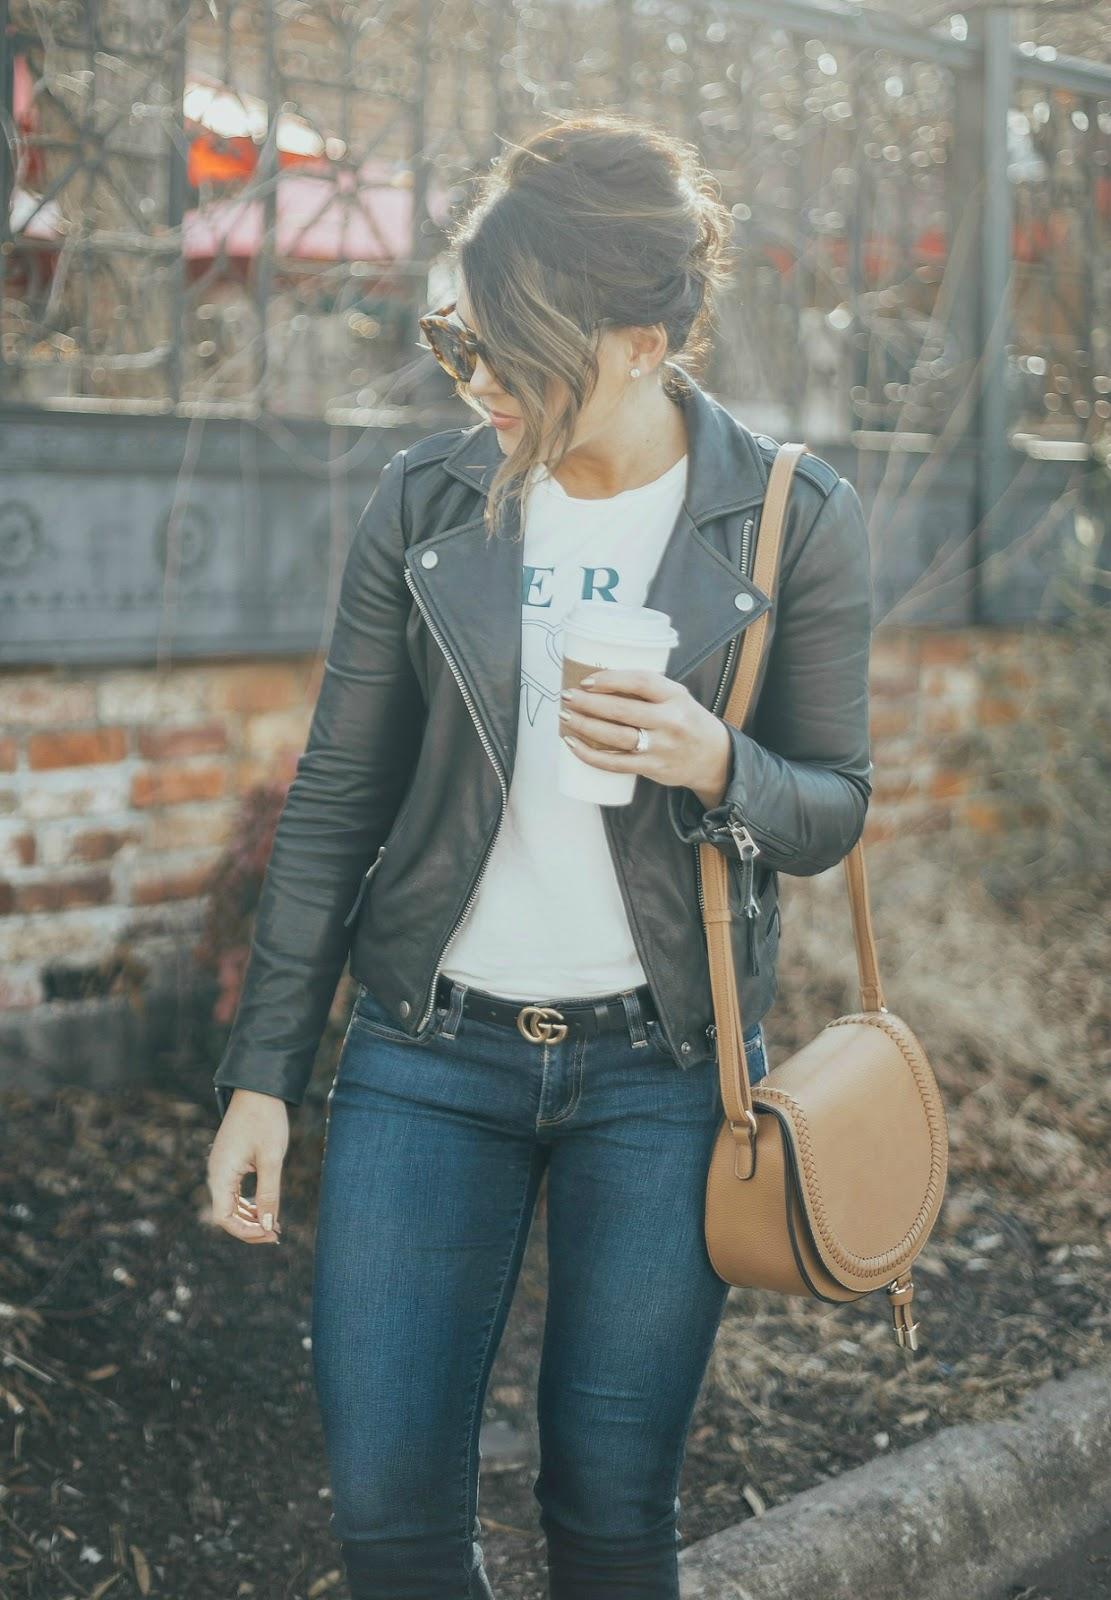 moto leather jacket, gucci marmont belt, life and messy hair, xo samantha brooke, sam brooke photo, samantha brooke photography, nc photographer, greensboro photographer, nc blogger, casual winter style